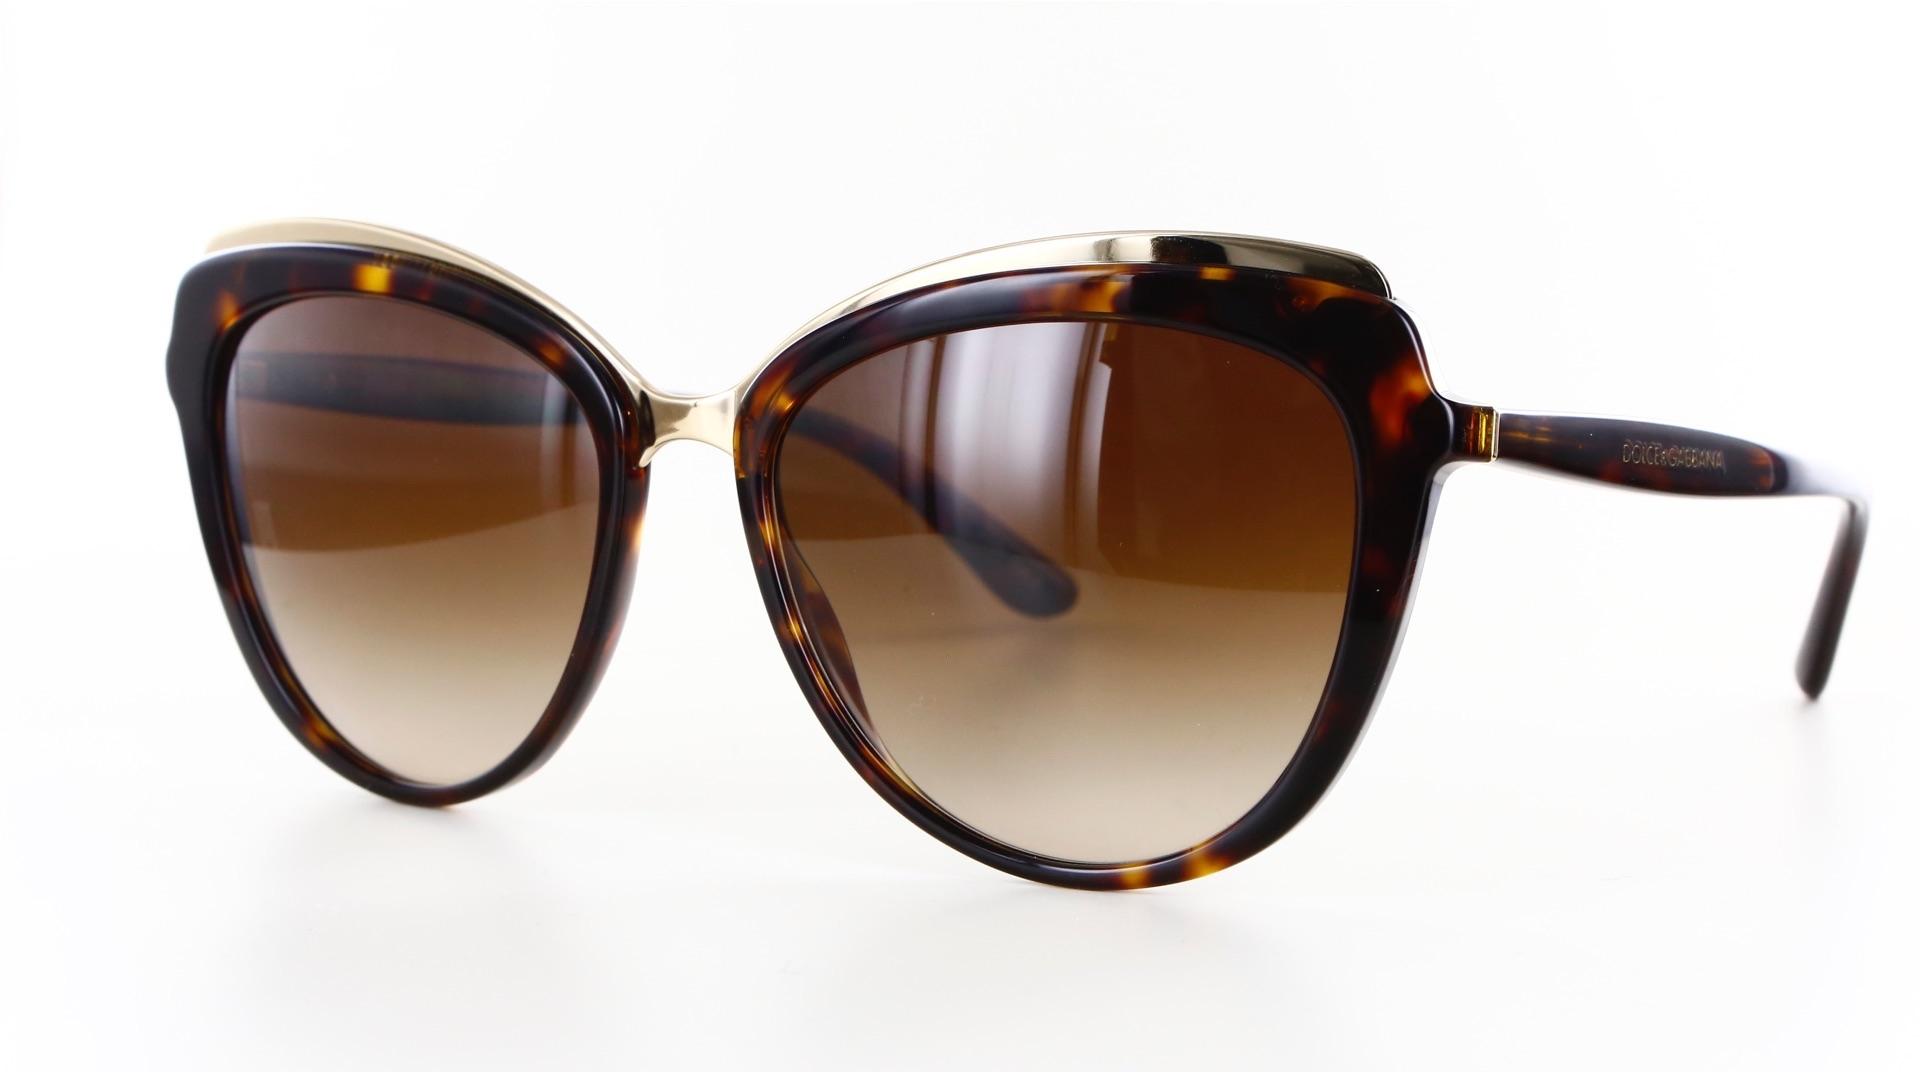 Dolce & Gabbana - ref: 76717